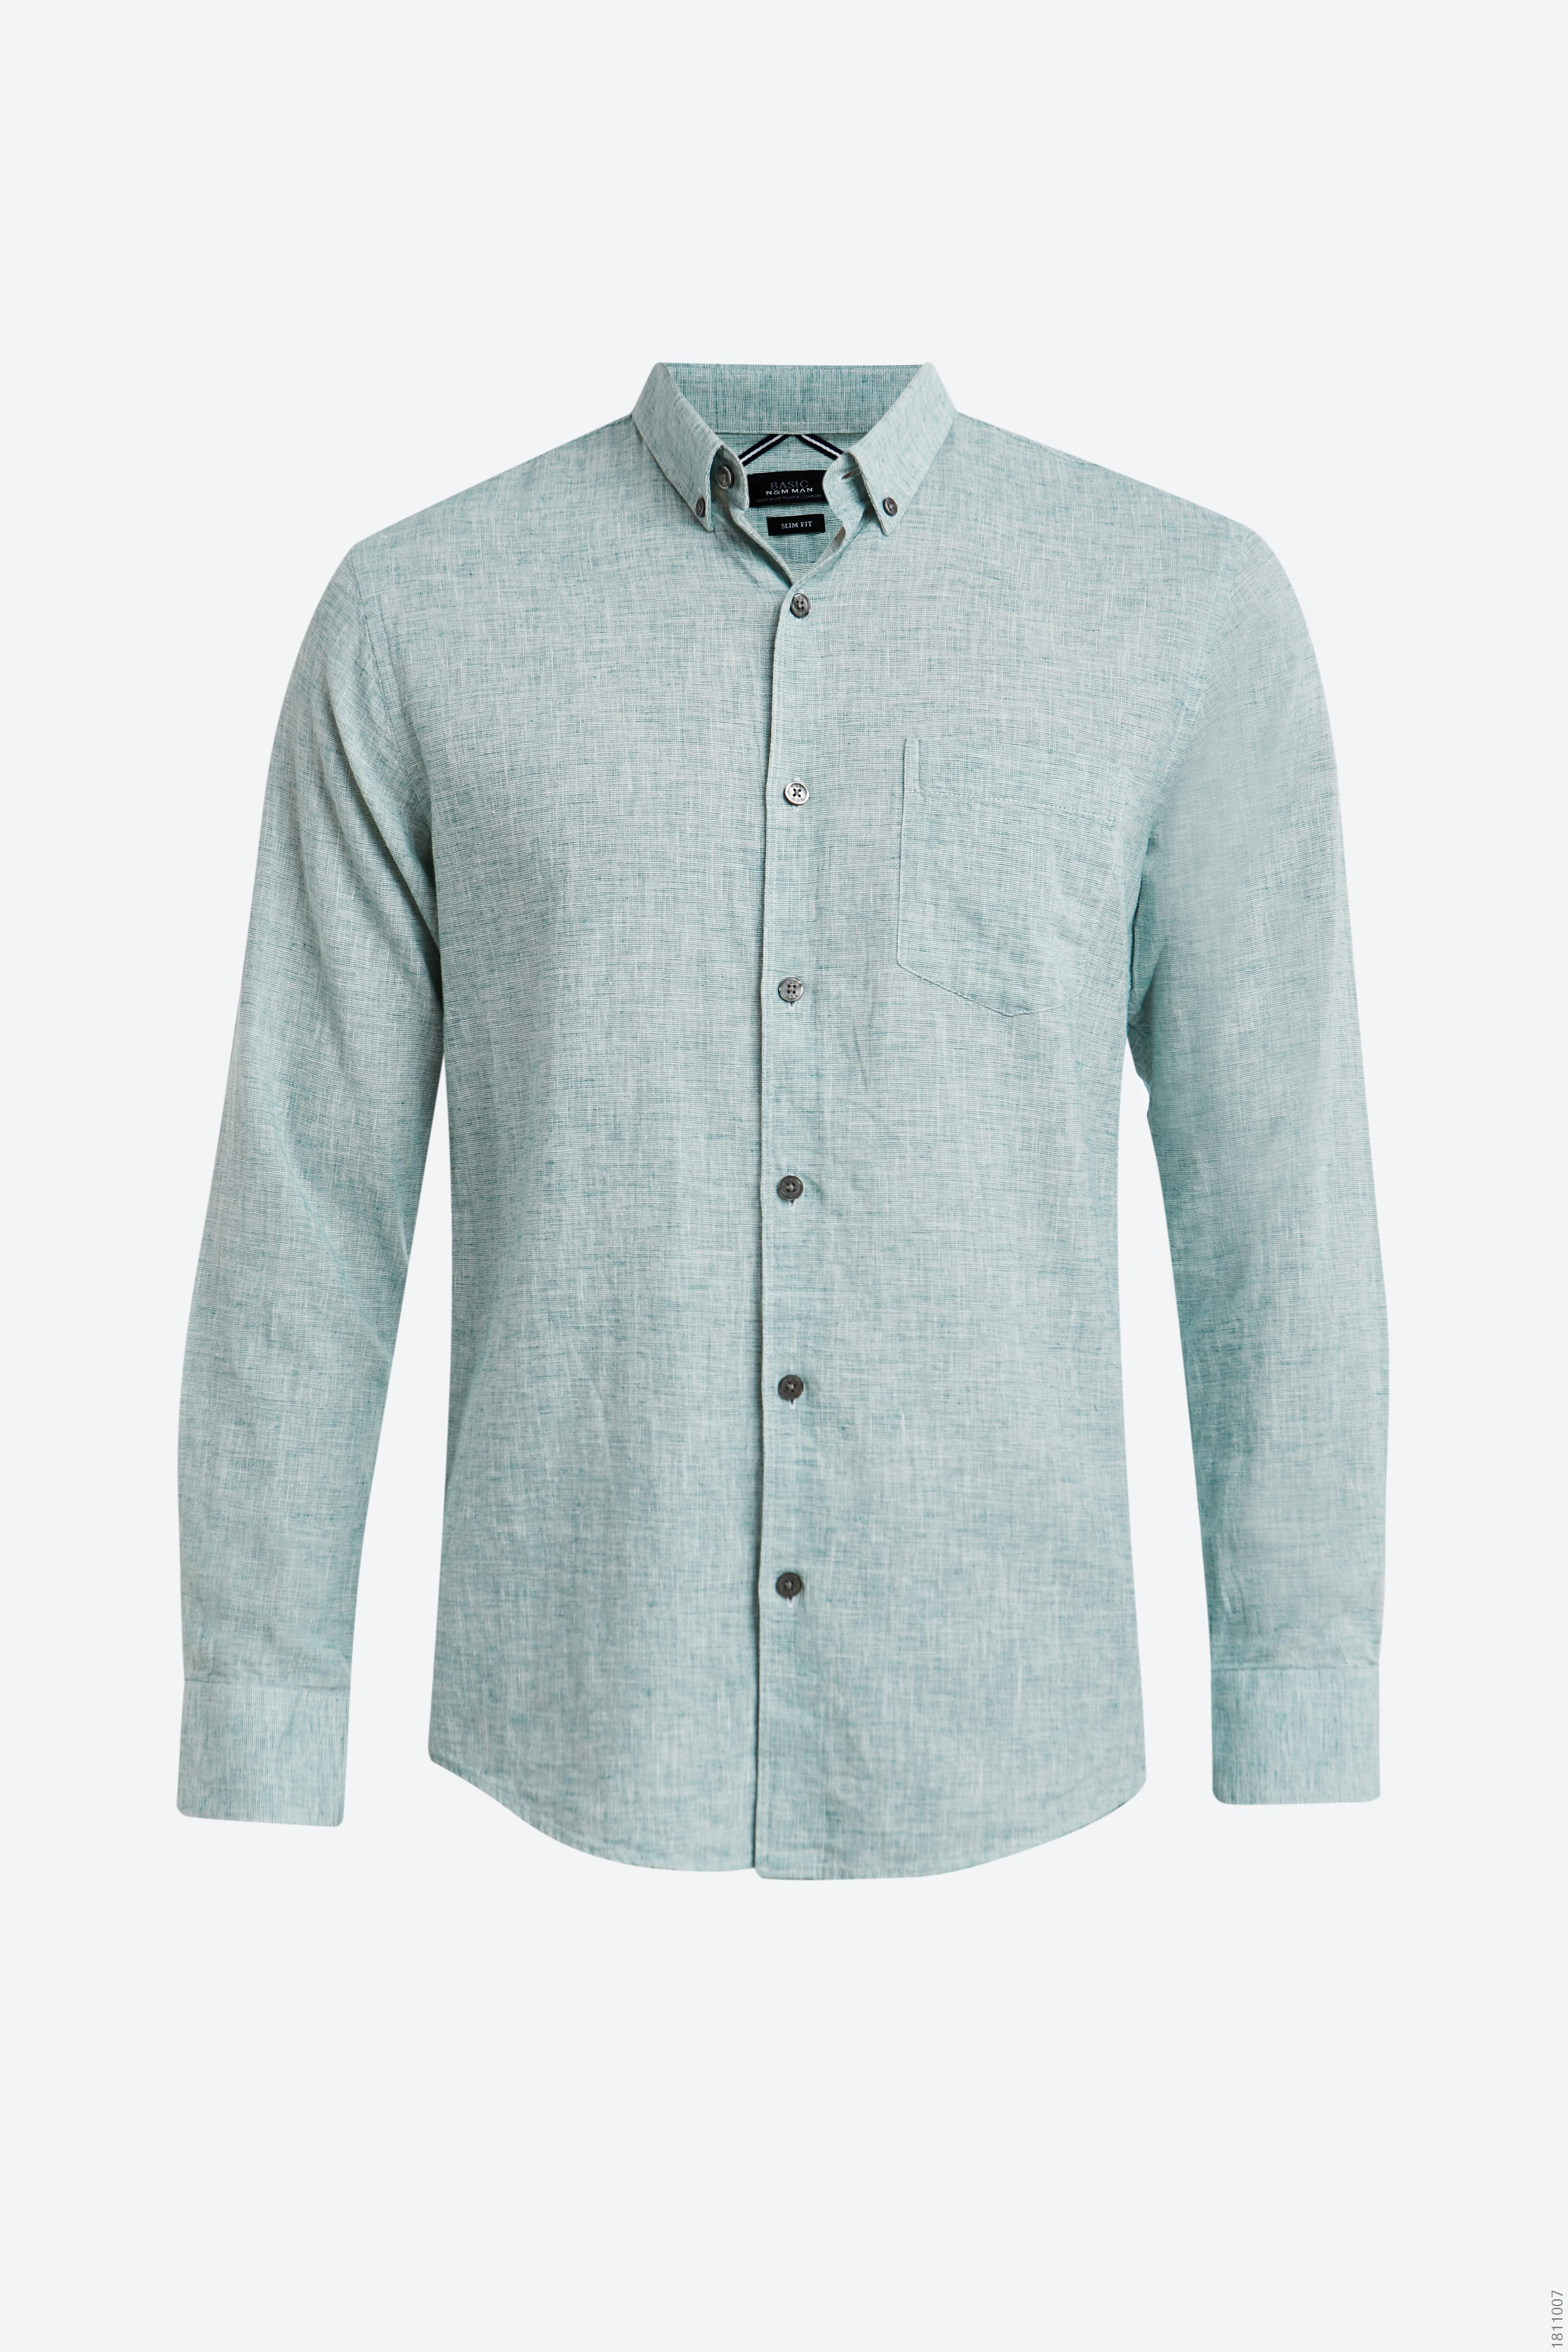 áo sơmi nam -1811007